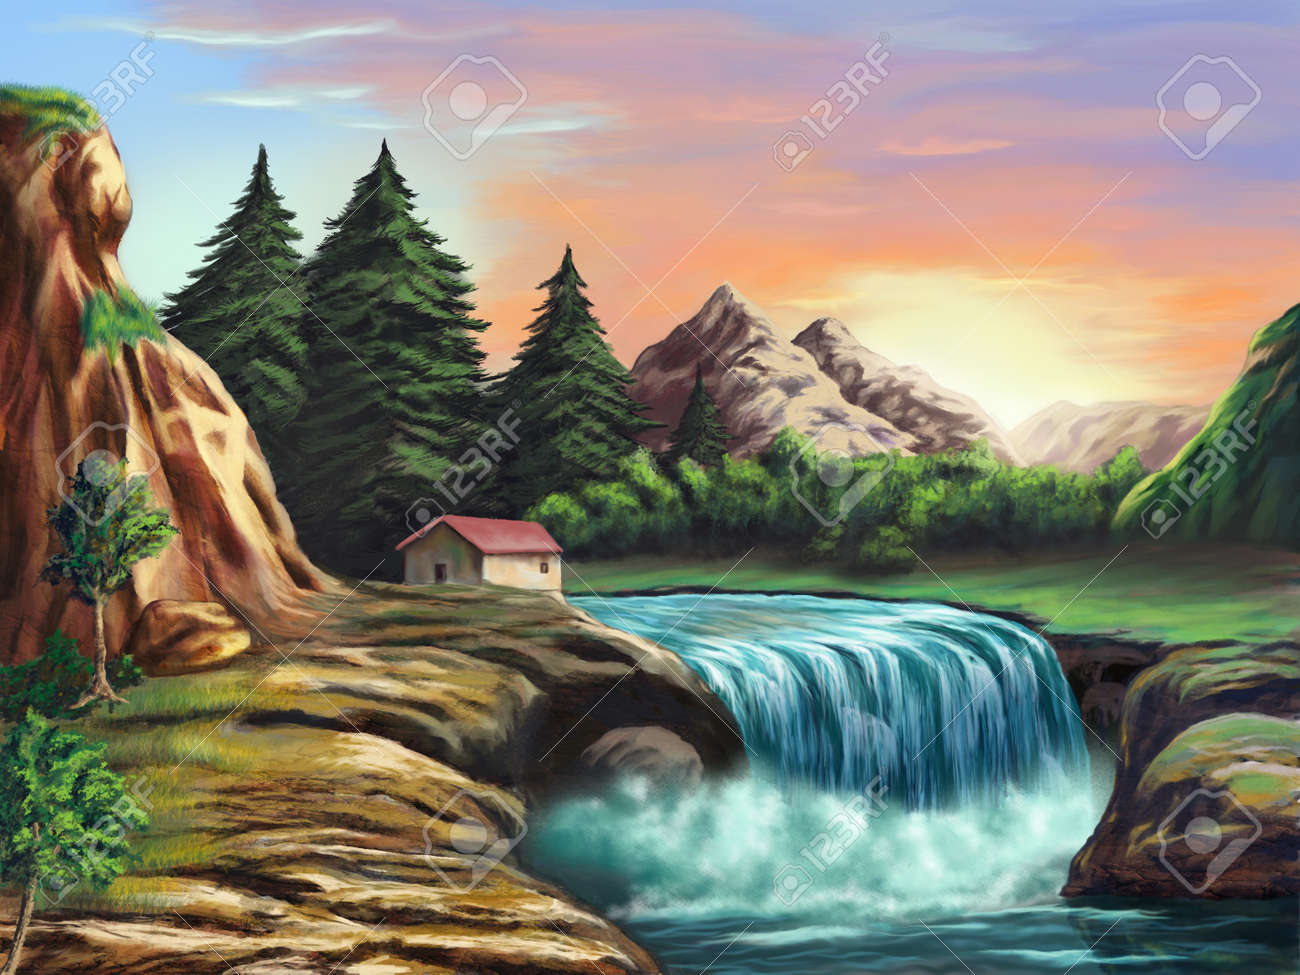 Waterfall in an imaginary landscape at sunset. Original digital illustration. Stock Illustration - 4585960